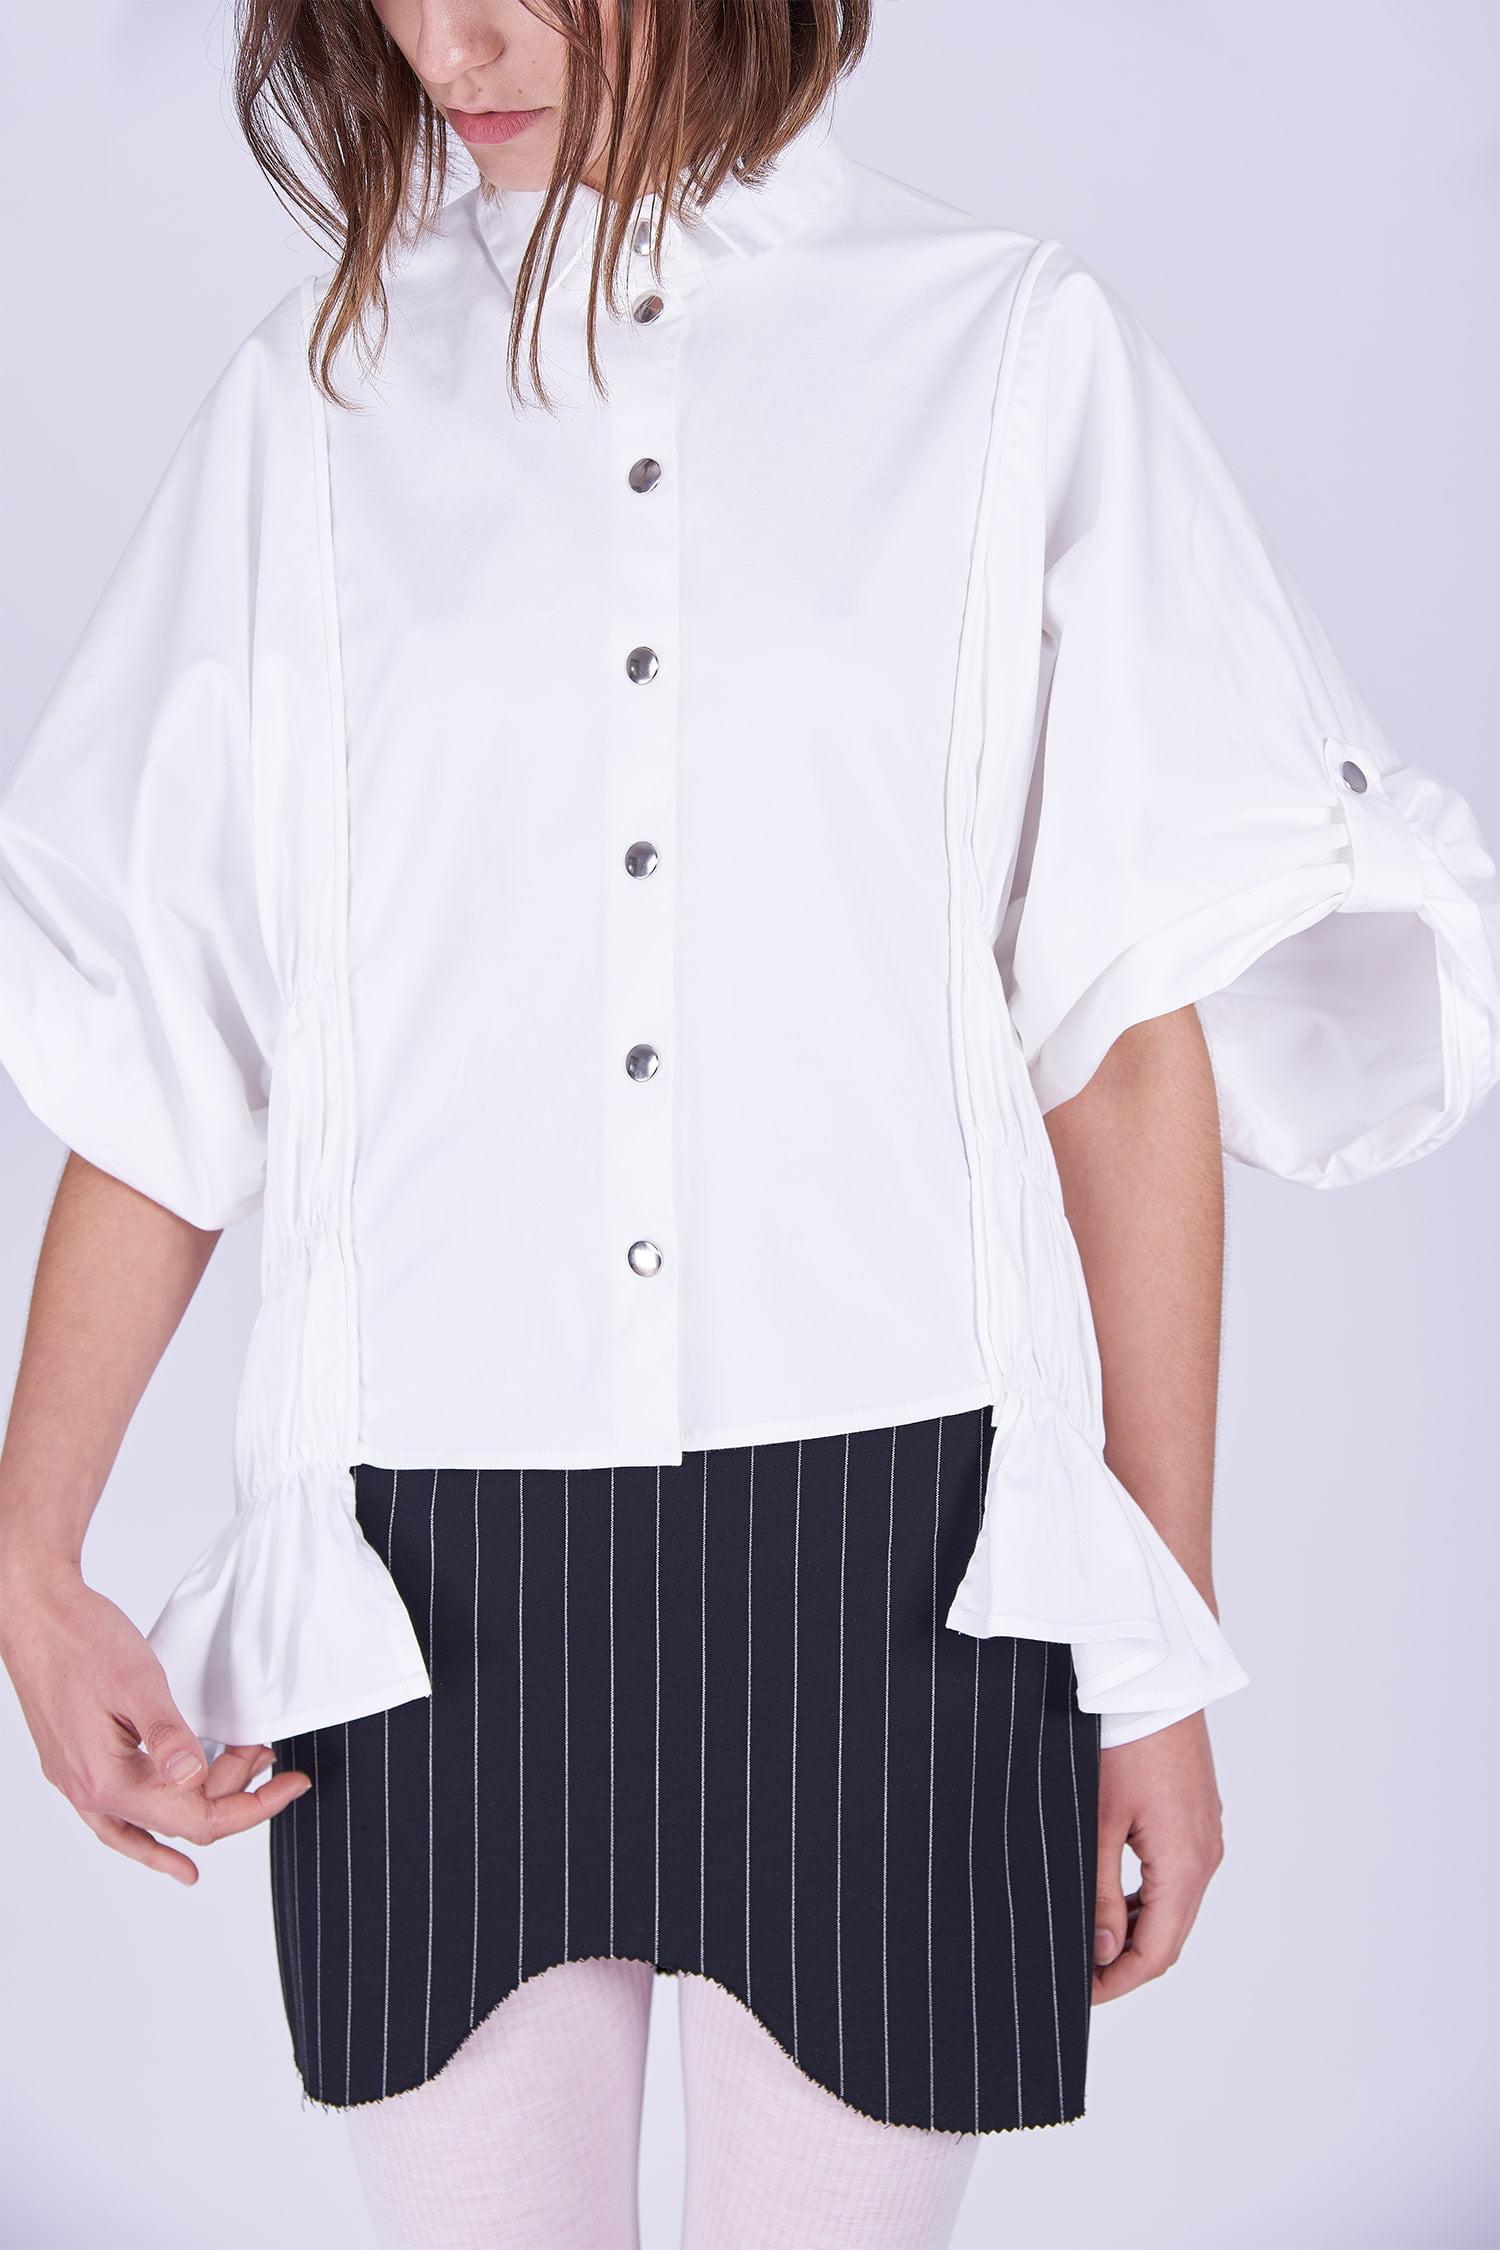 Acephala Ps2020 Black Striped Skirt White Exuberant Gathered Czarna Spodnica Biala Koszula Marszczona Detail 2